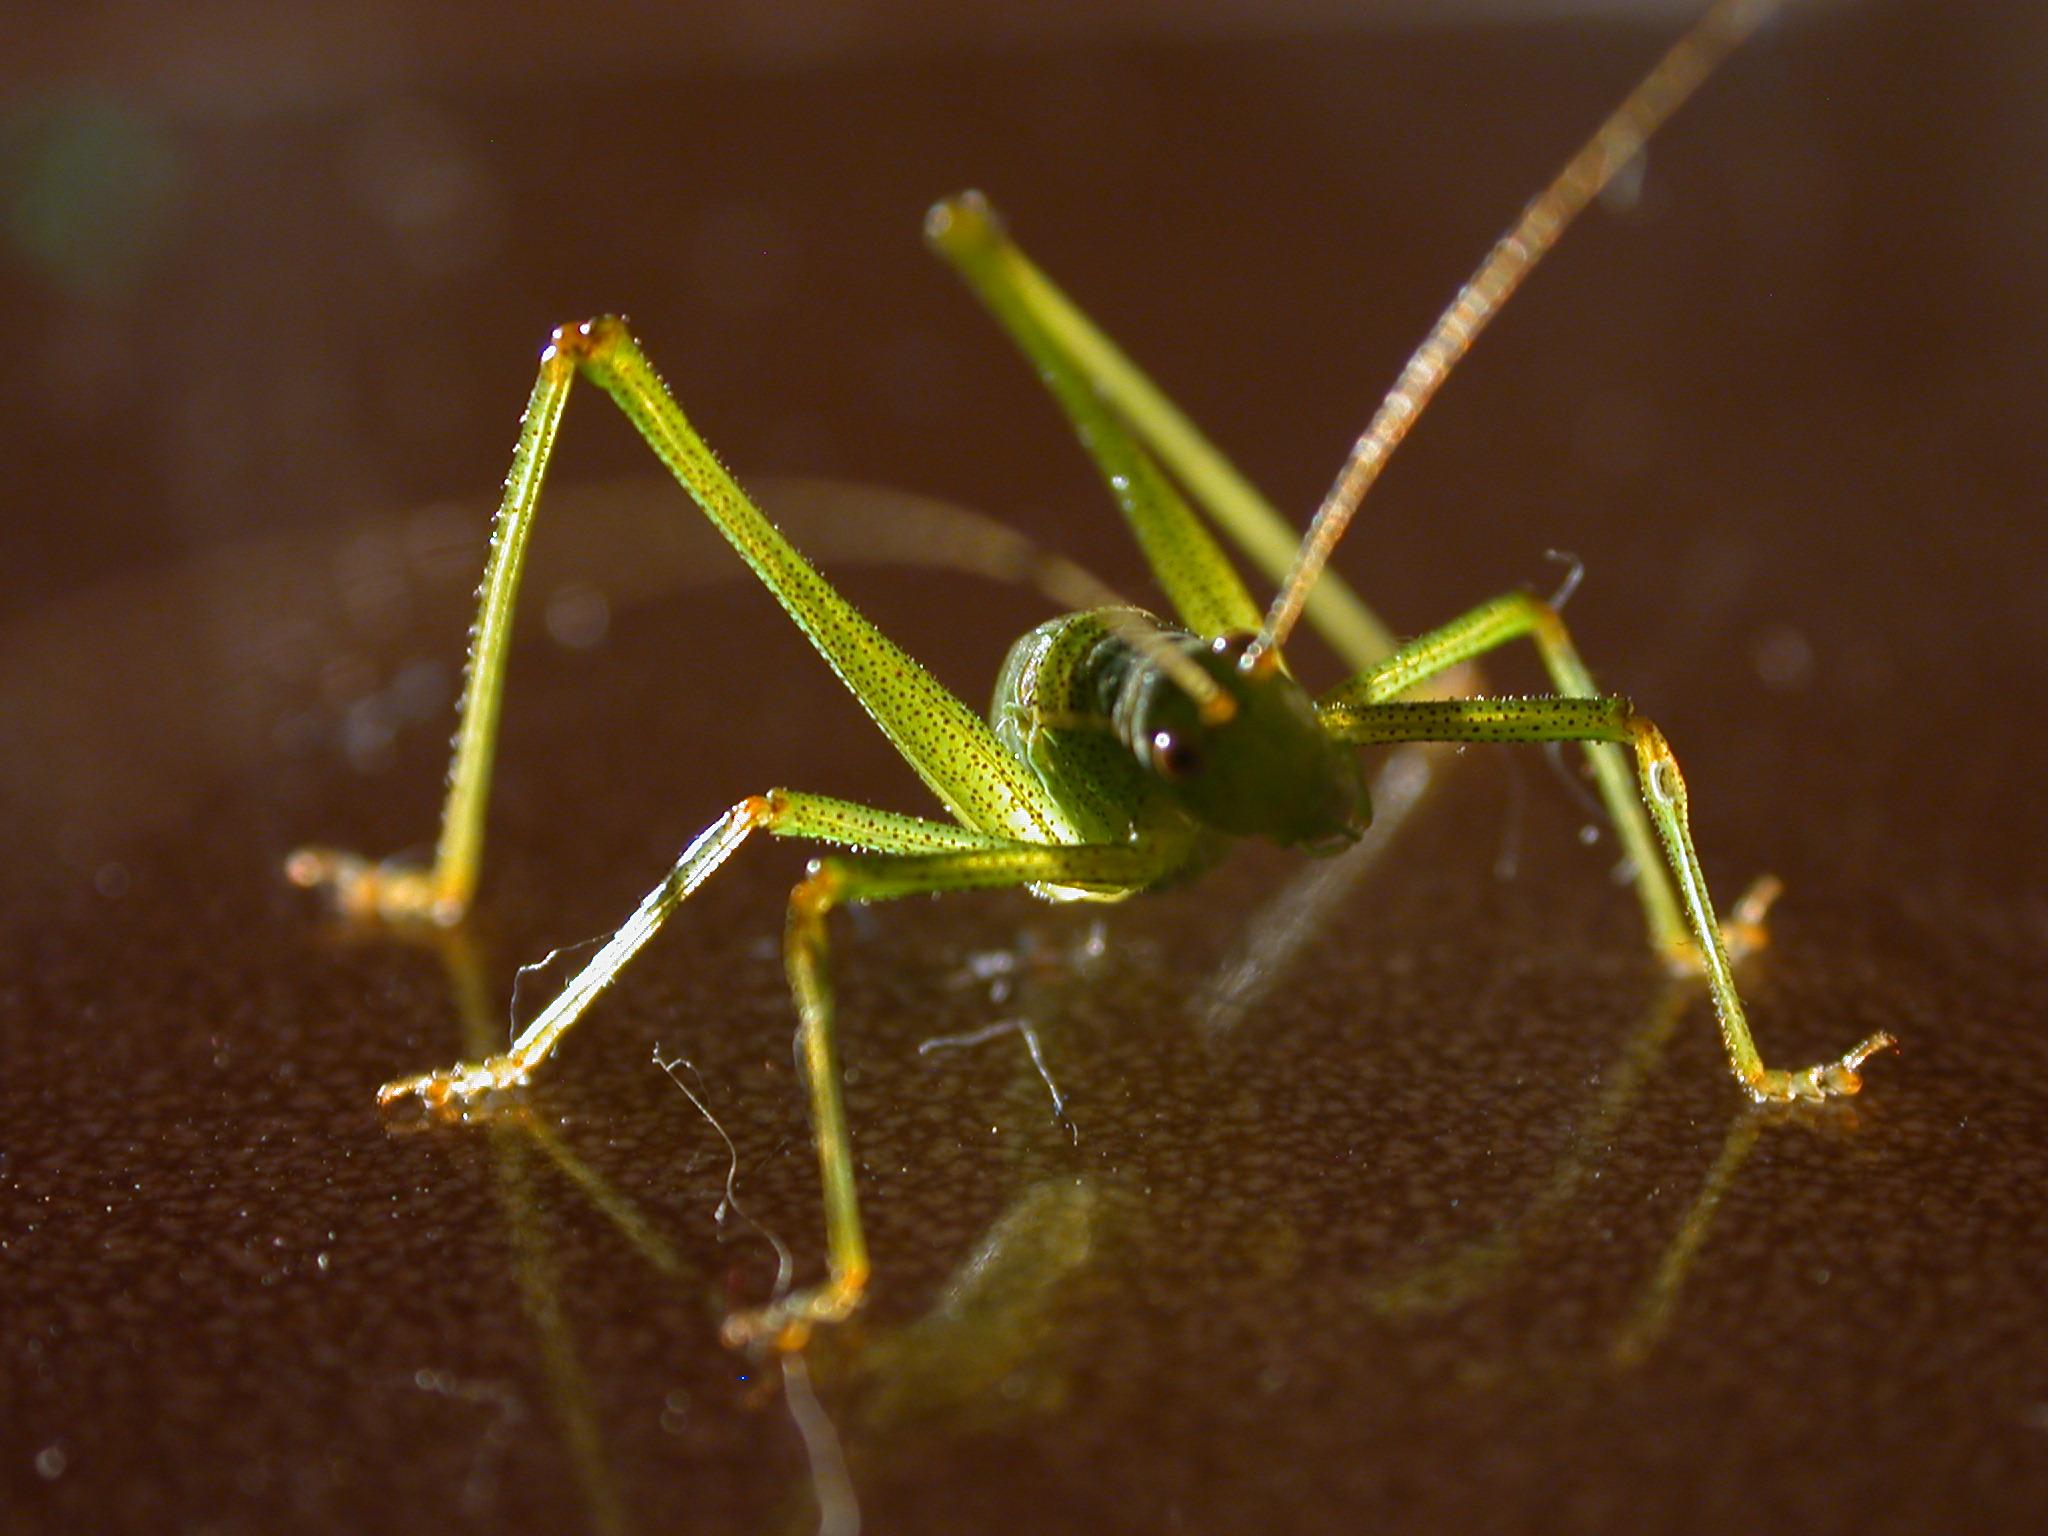 image after images grasshopper insect green long legs antennae alien. Black Bedroom Furniture Sets. Home Design Ideas